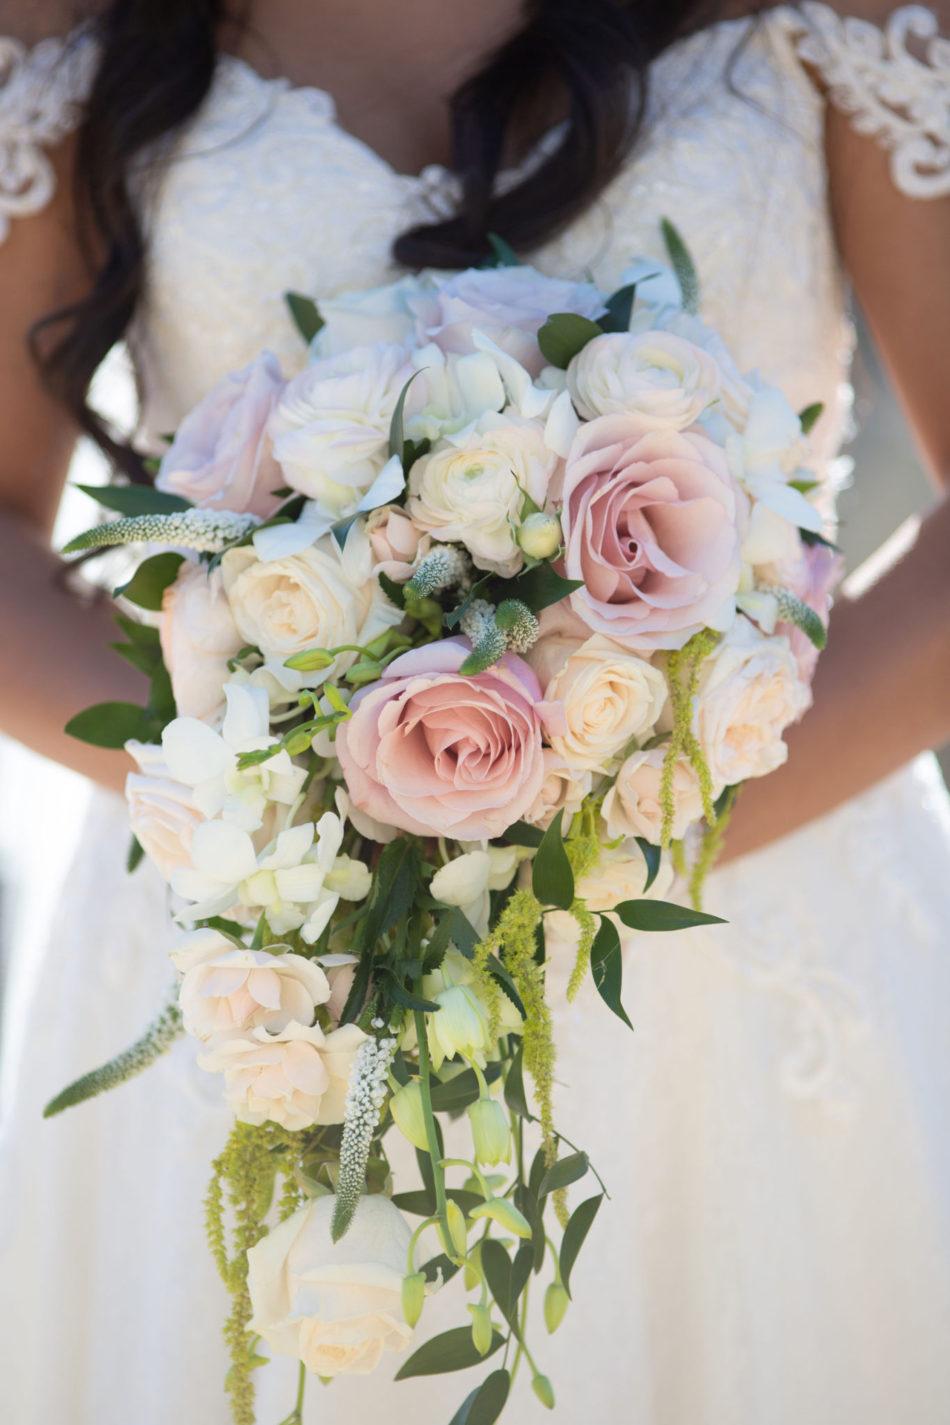 pink bouquet, blush bouquet, wedding bouquet, floral design, florist, wedding florist, wedding flowers, orange county weddings, orange county wedding florist, orange county florist, orange county floral design, flowers by cina